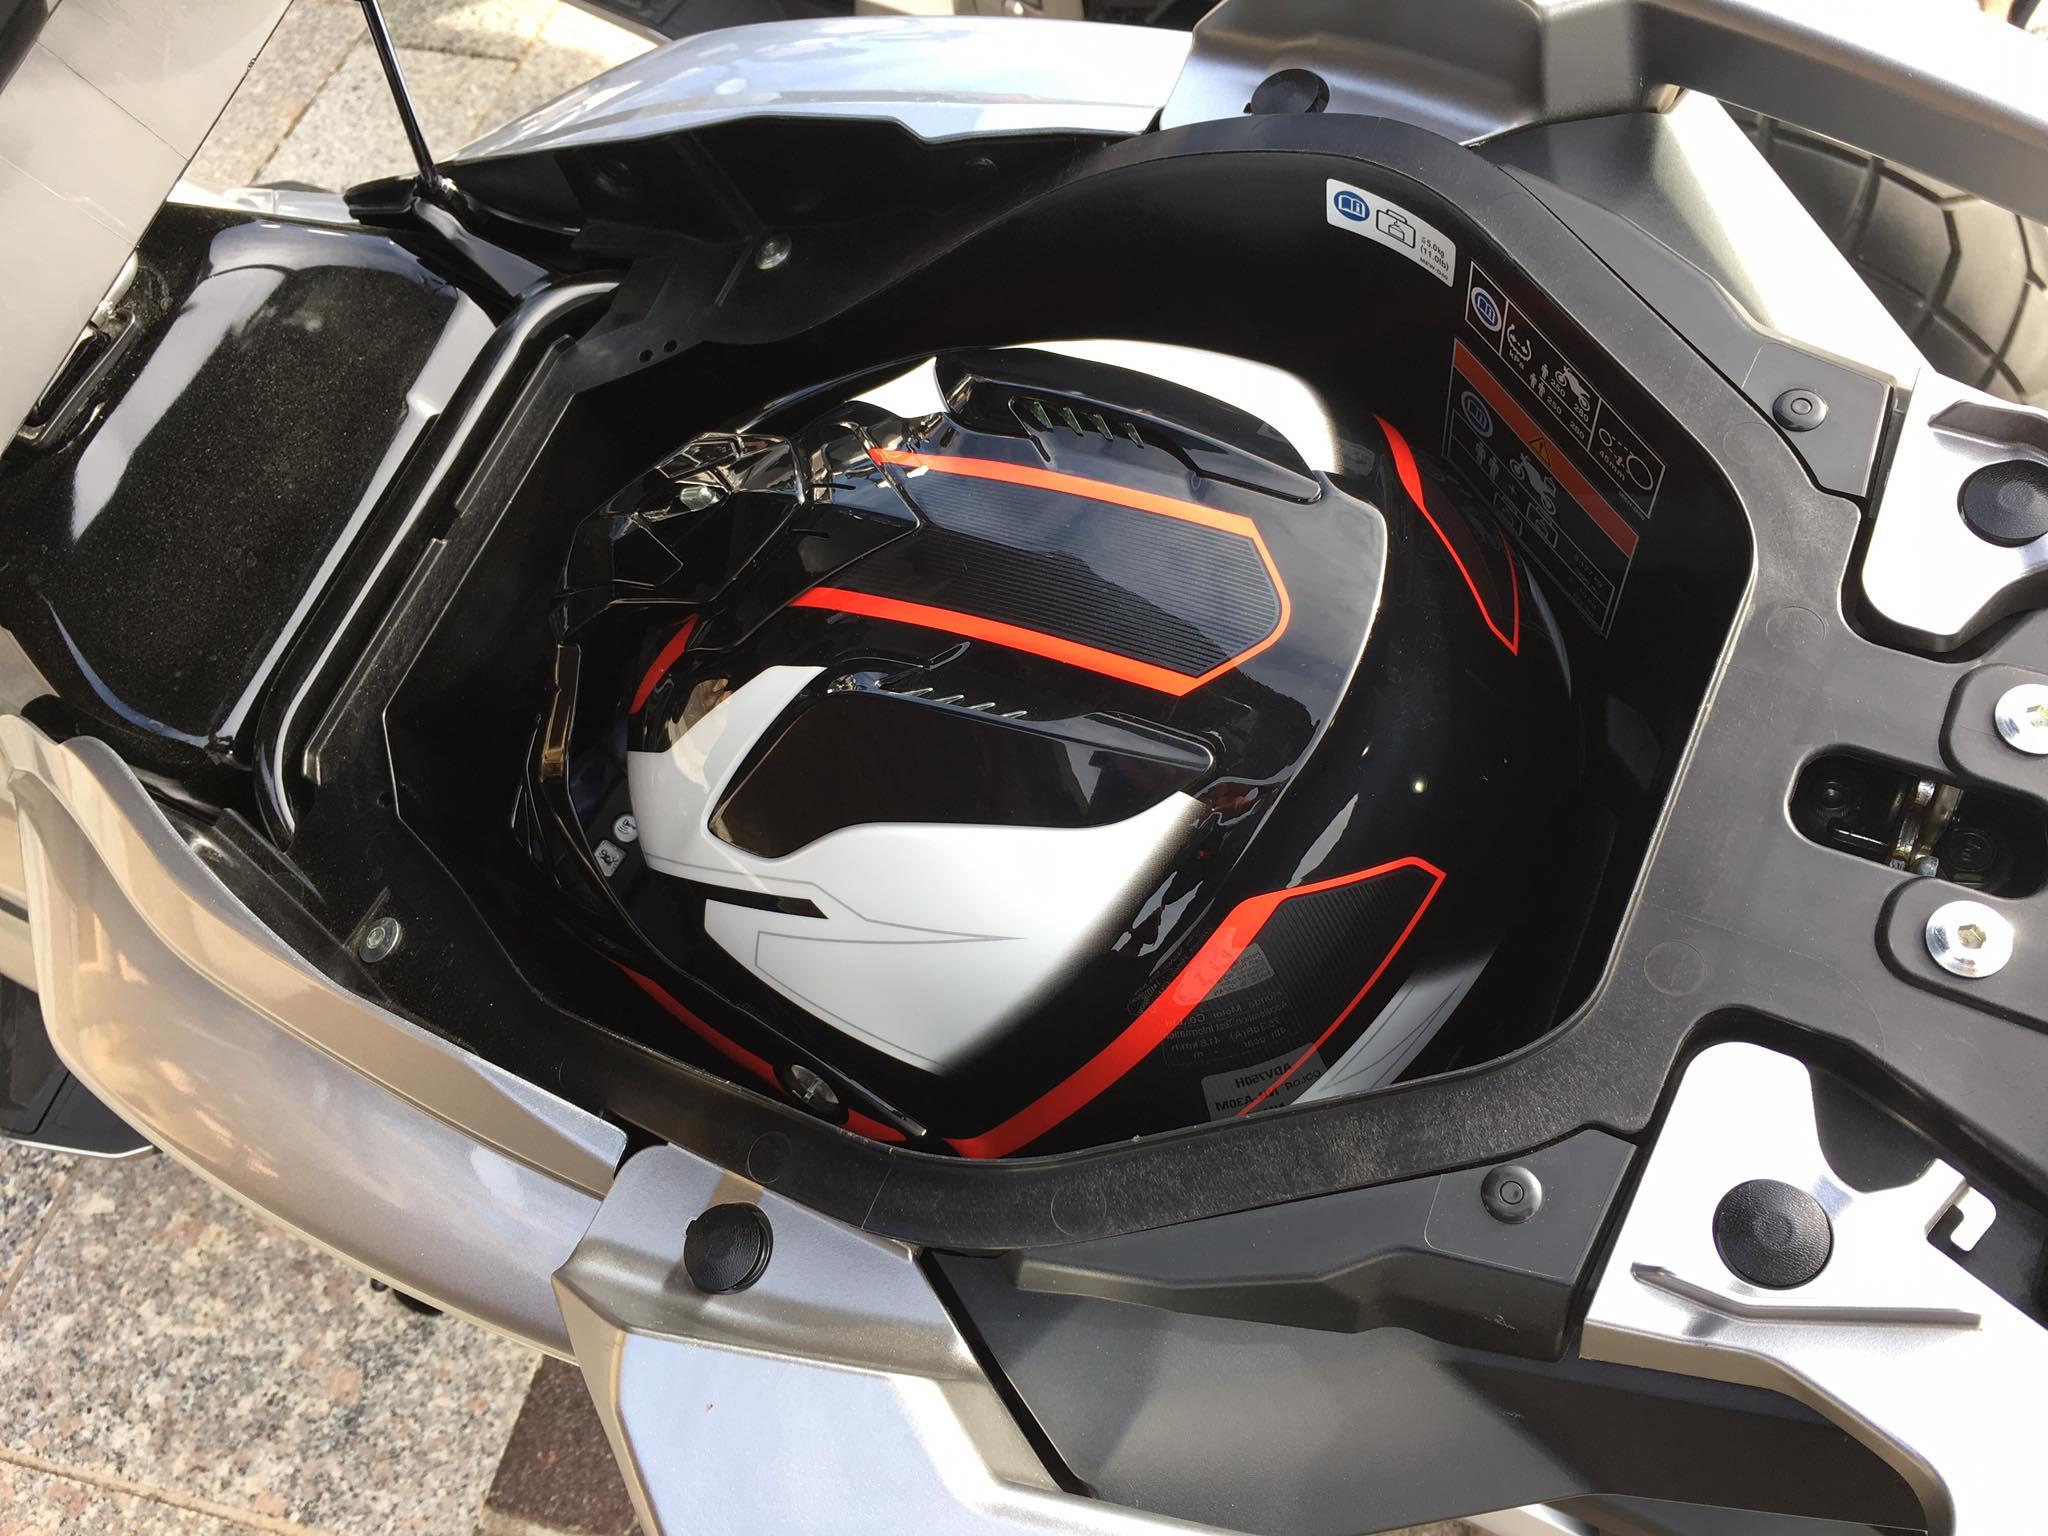 Honda X-ADV Primeras impresiones